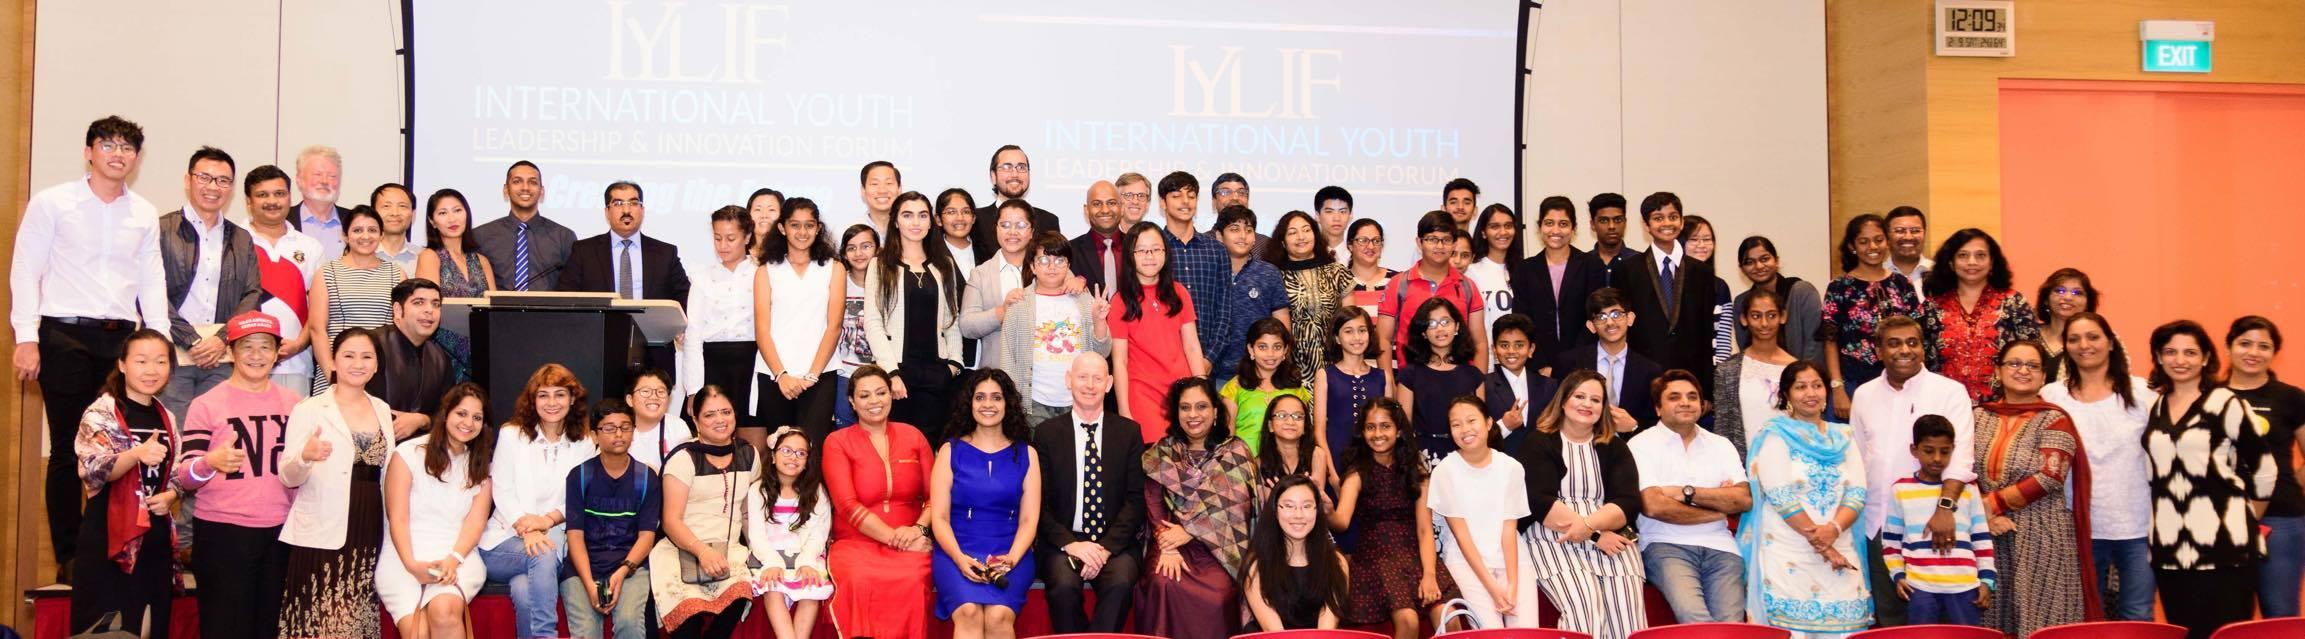 International Youth leadership and innovation forum IYLIF